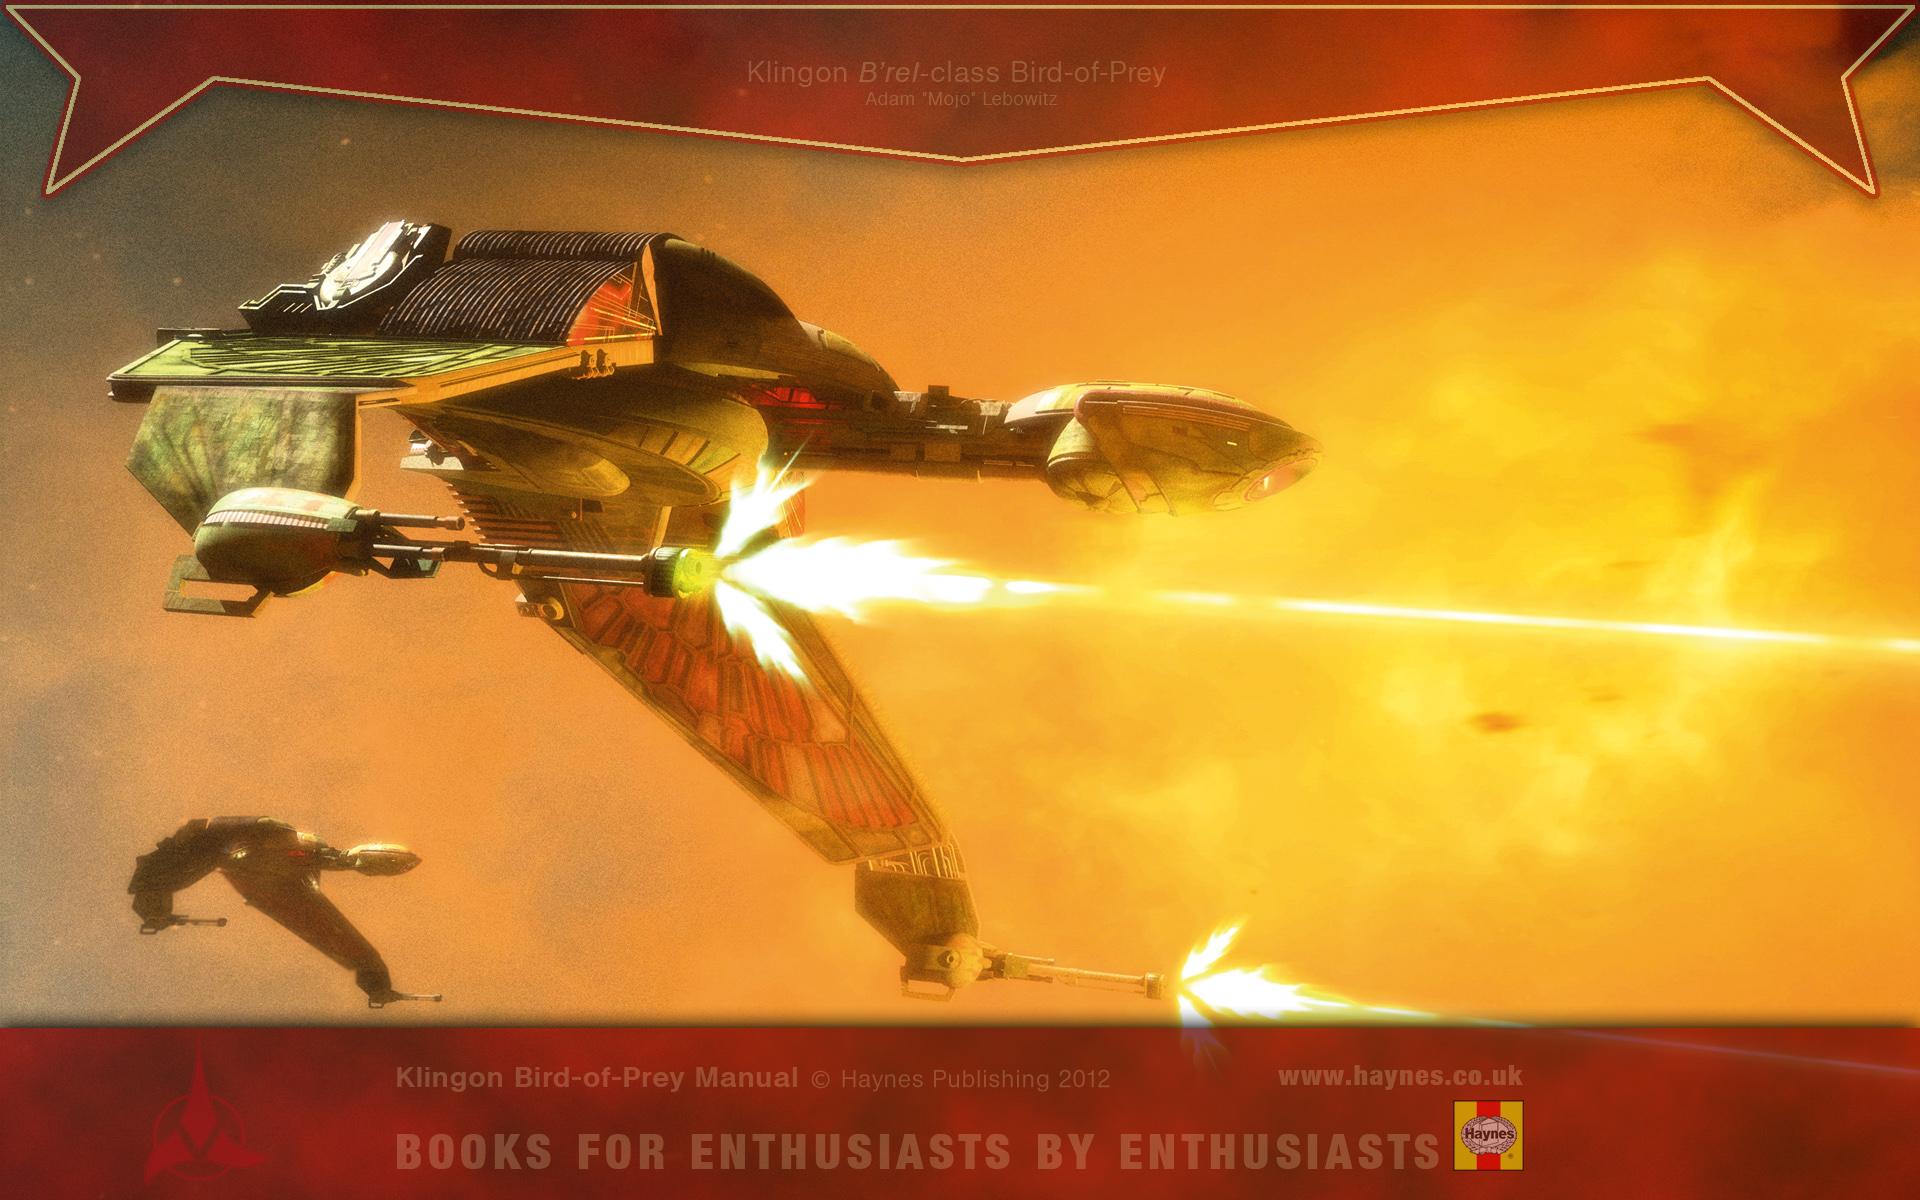 The Klingon Bird Of Prey Manual Reveals The Secrets Klingon Bird